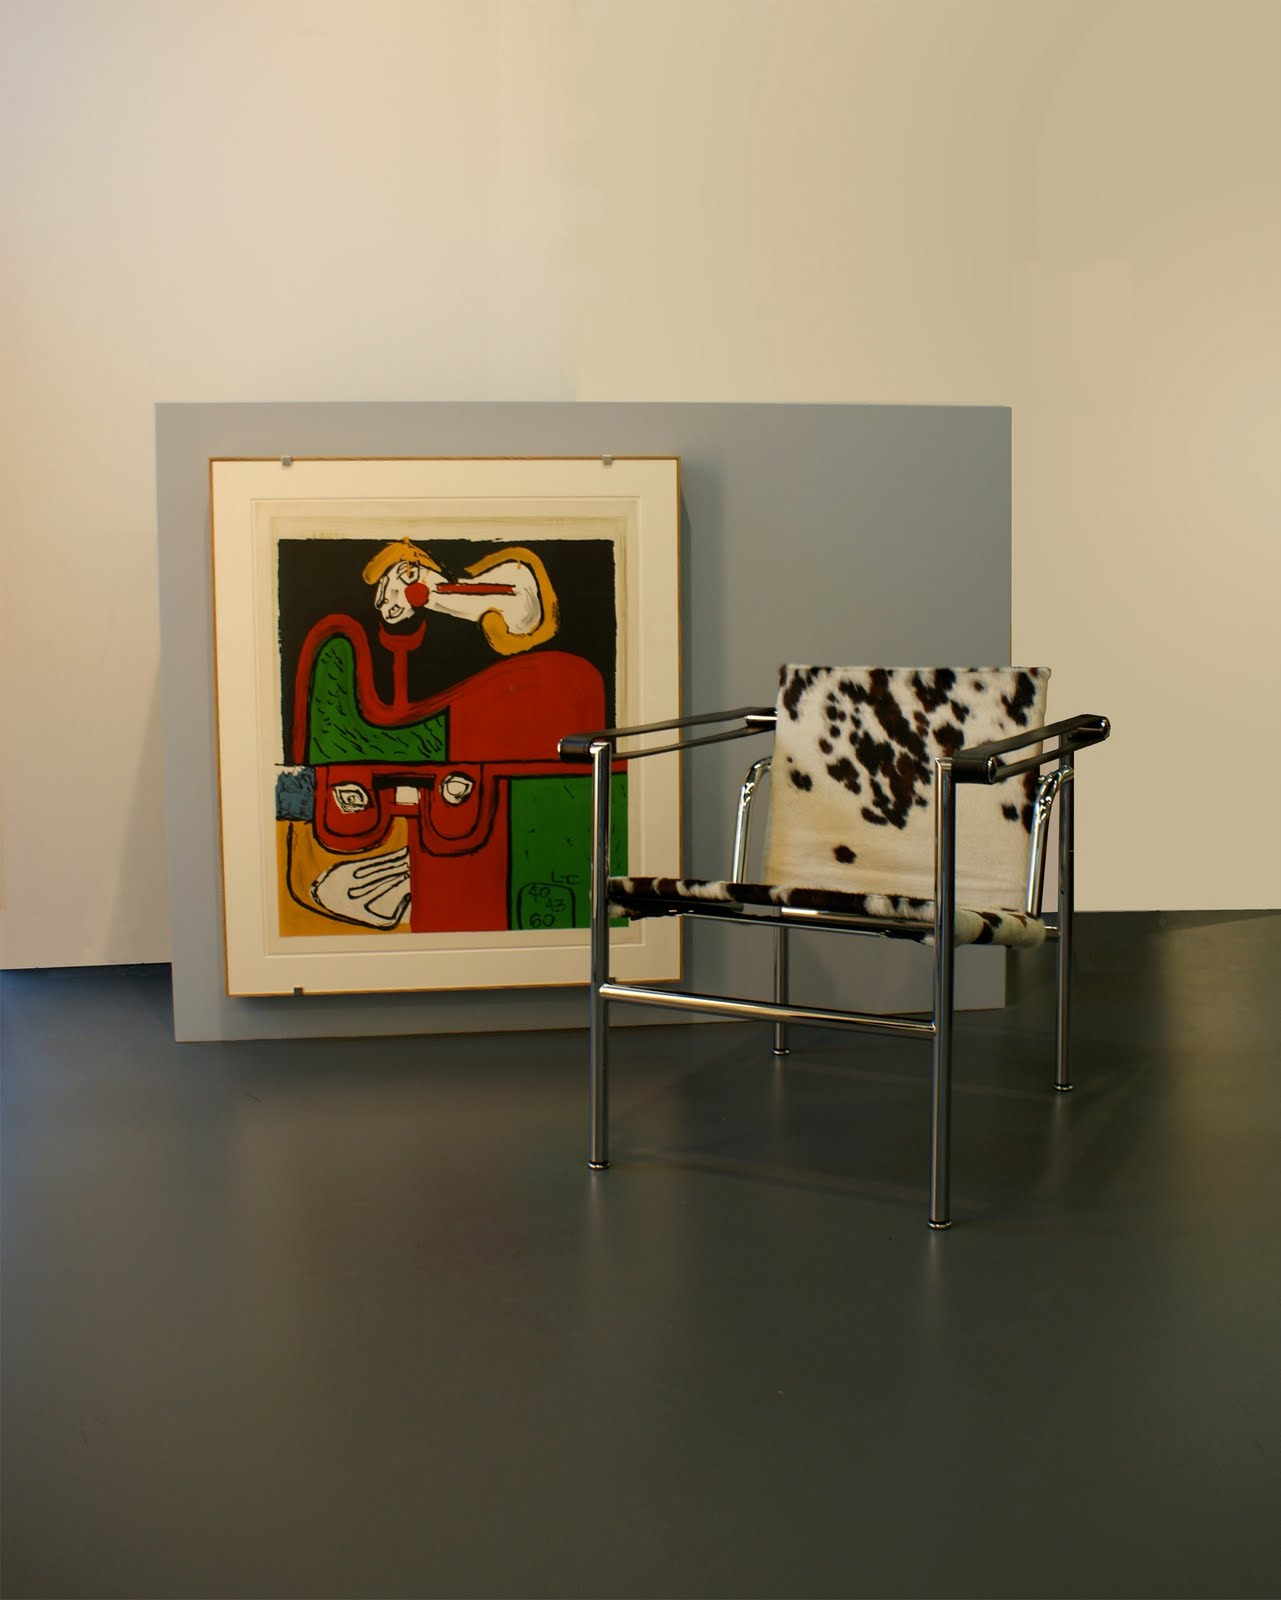 schaffhausen ausstellung le corbusier baumeister des. Black Bedroom Furniture Sets. Home Design Ideas